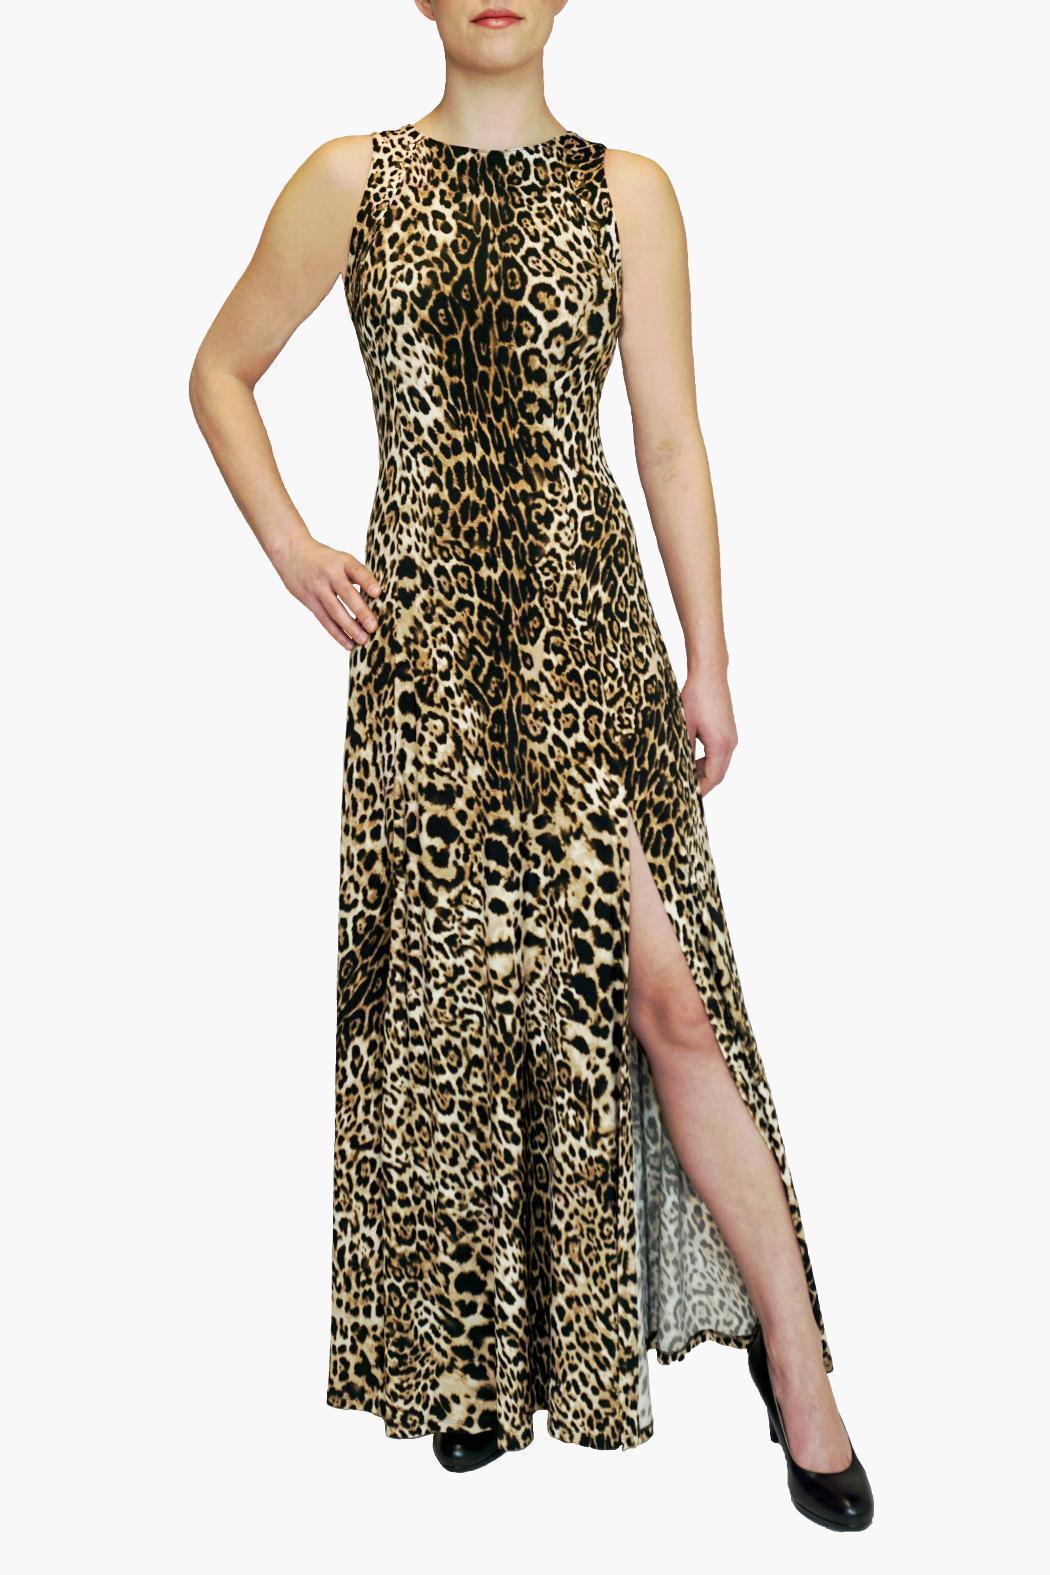 c9781a896eb0 JOSEPH RIBKOFF Leopard print maxi dress   The Volte